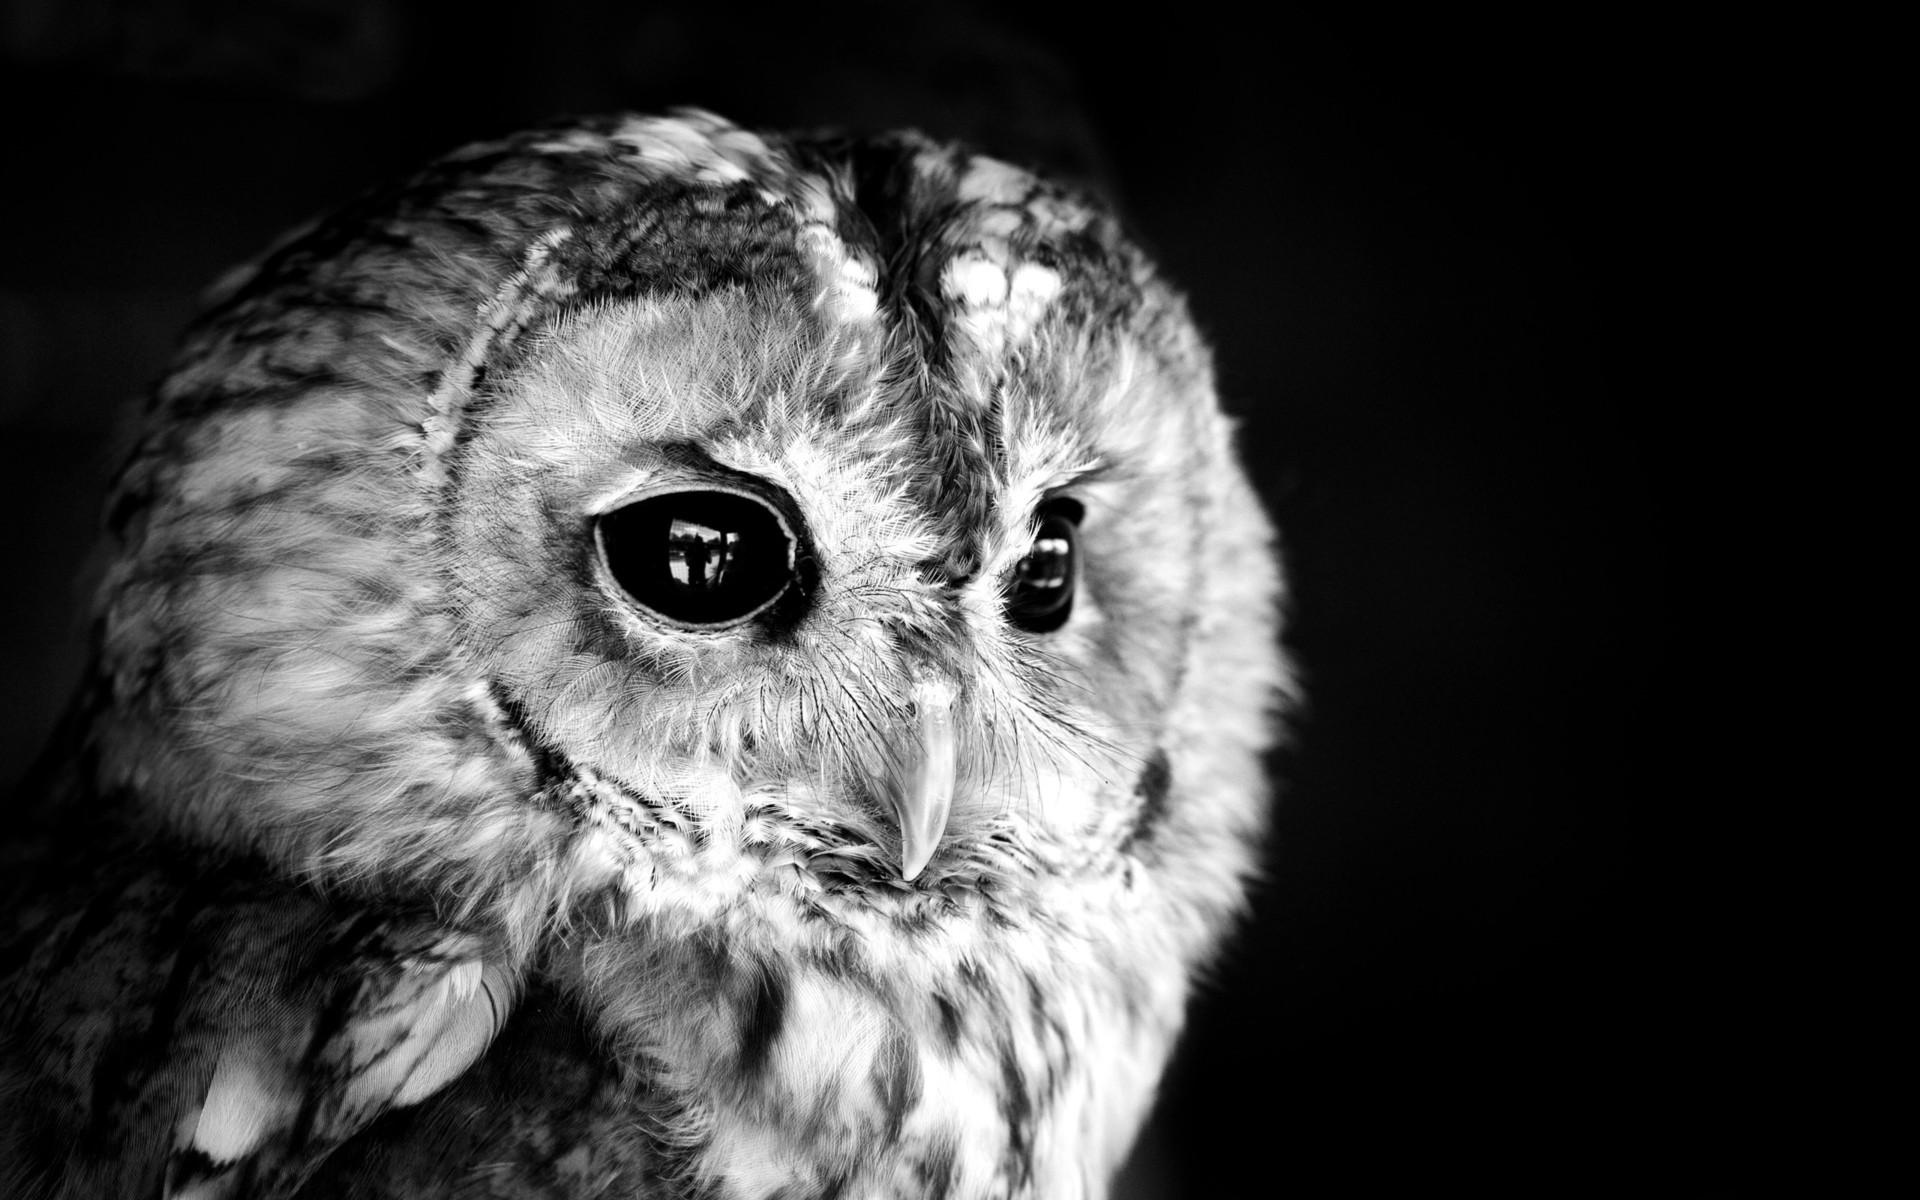 Res: 1920x1200, Black owl photo white monochrome face eyes feathers wallpaper |  |  55074 | WallpaperUP